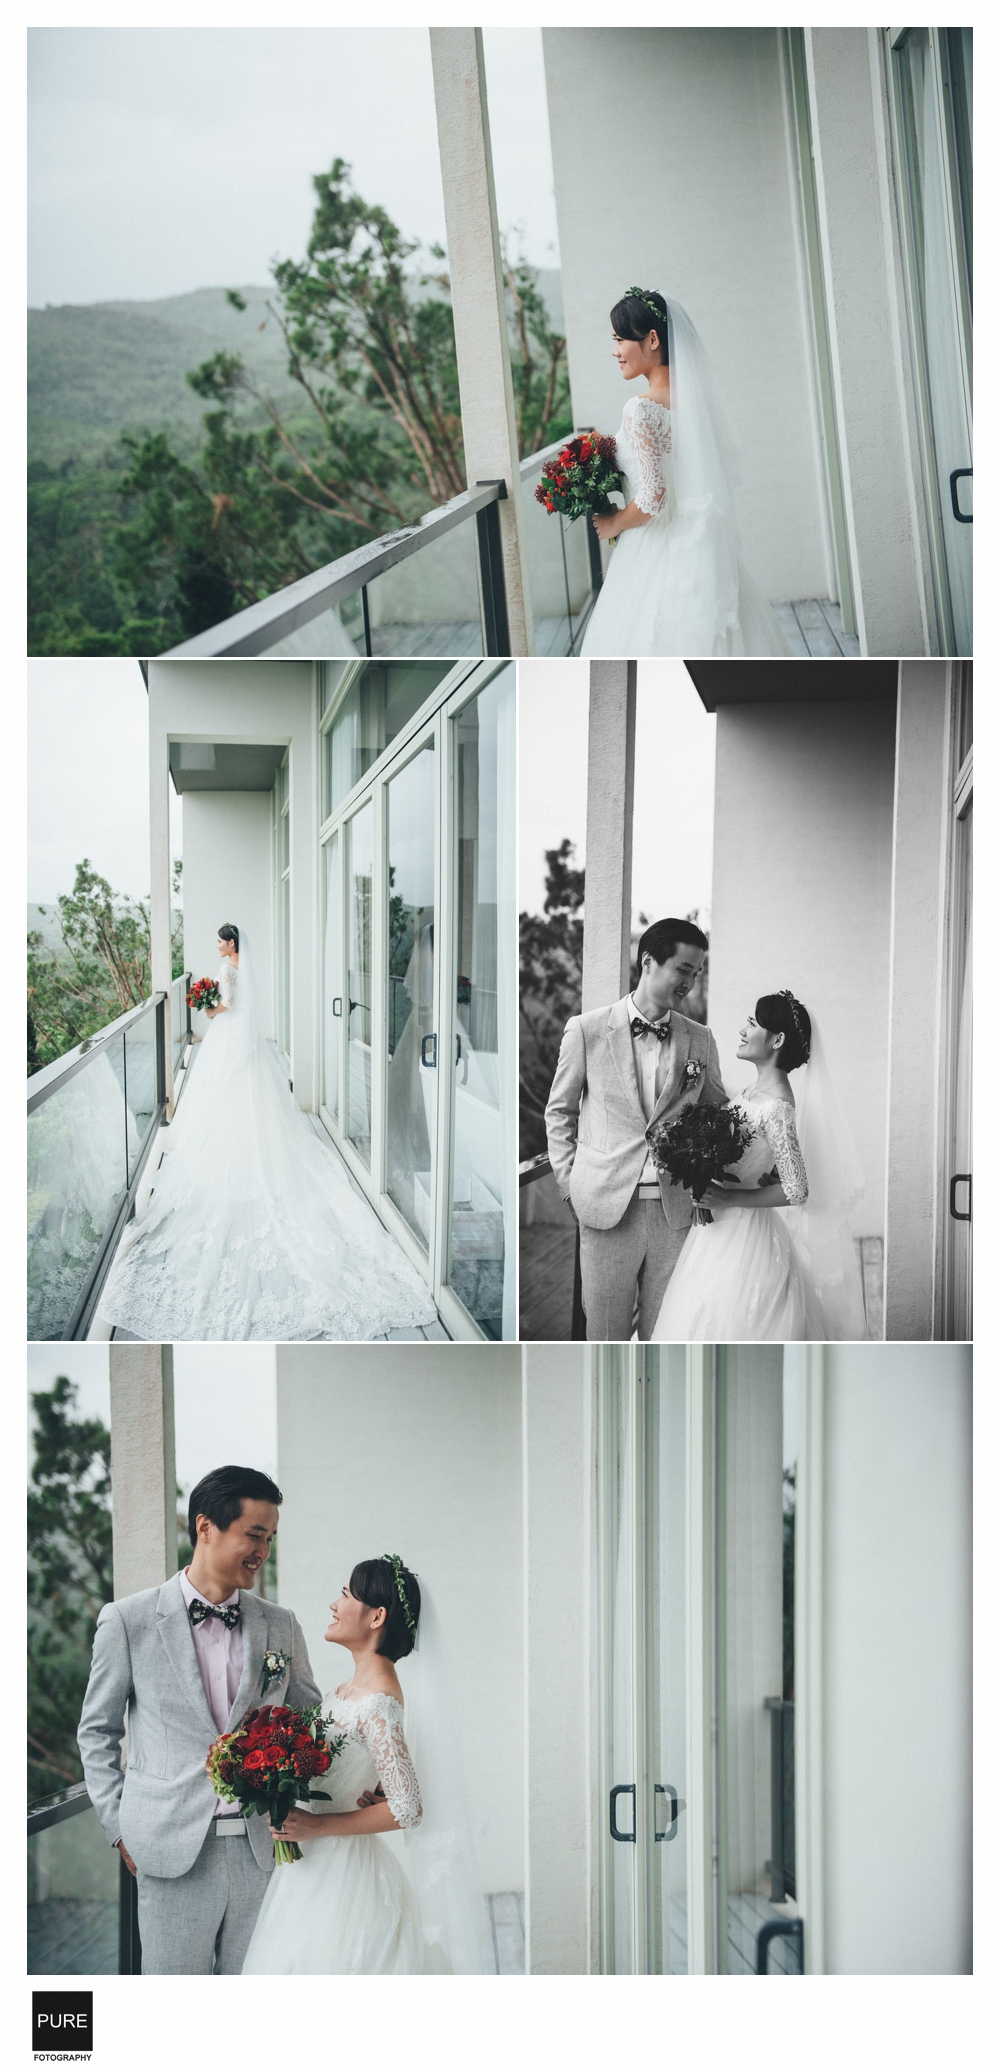 PUREFOTO_台灣婚禮平面攝影wedding_類婚紗攝影